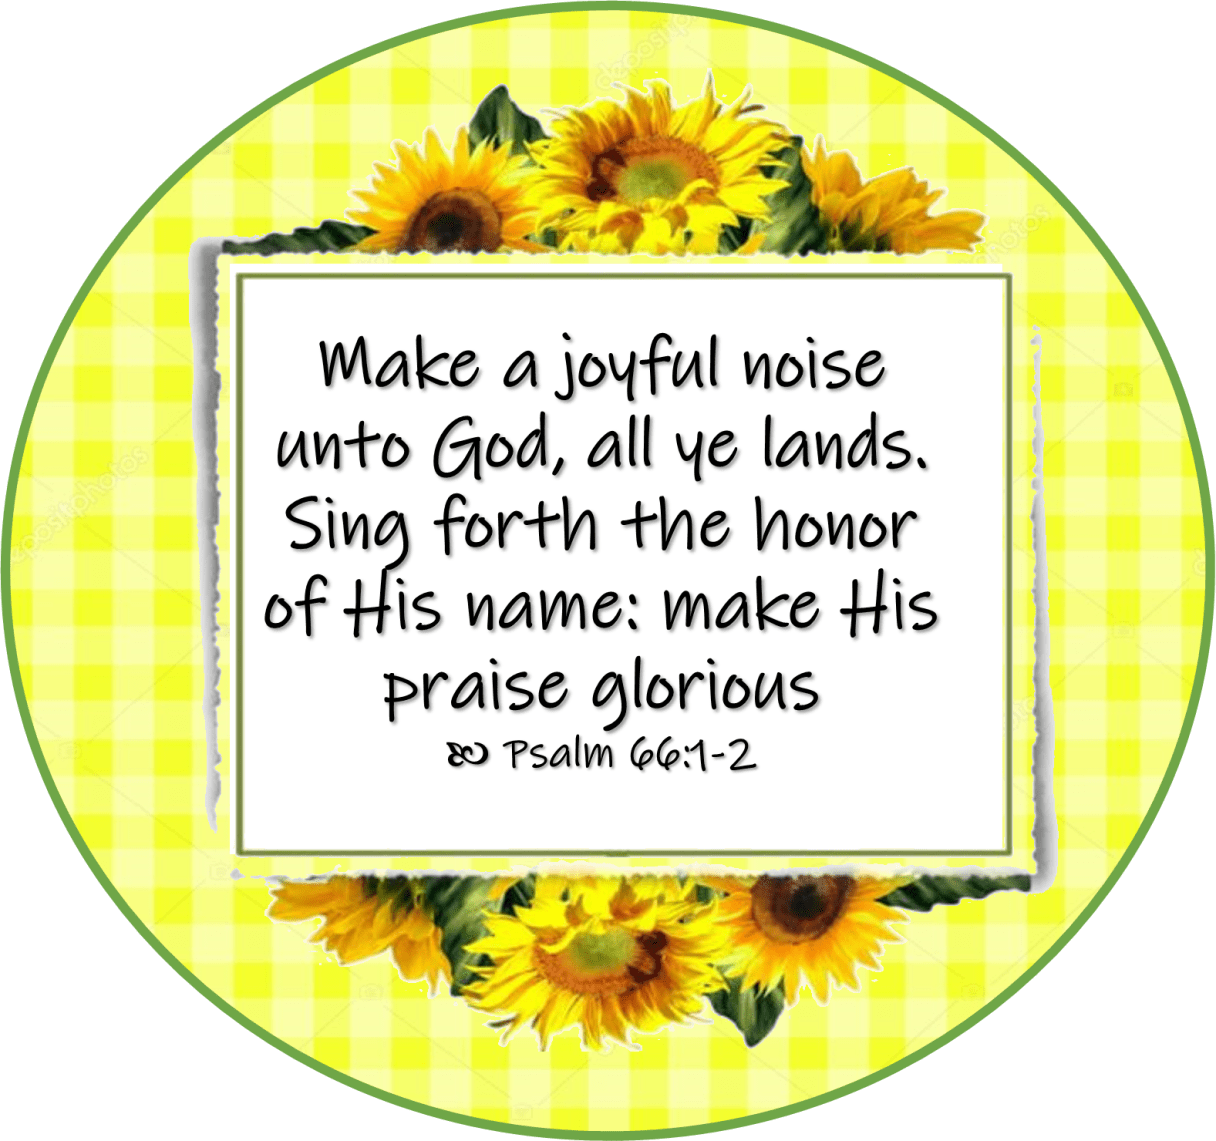 Aug 01 Psalm 66 1-2